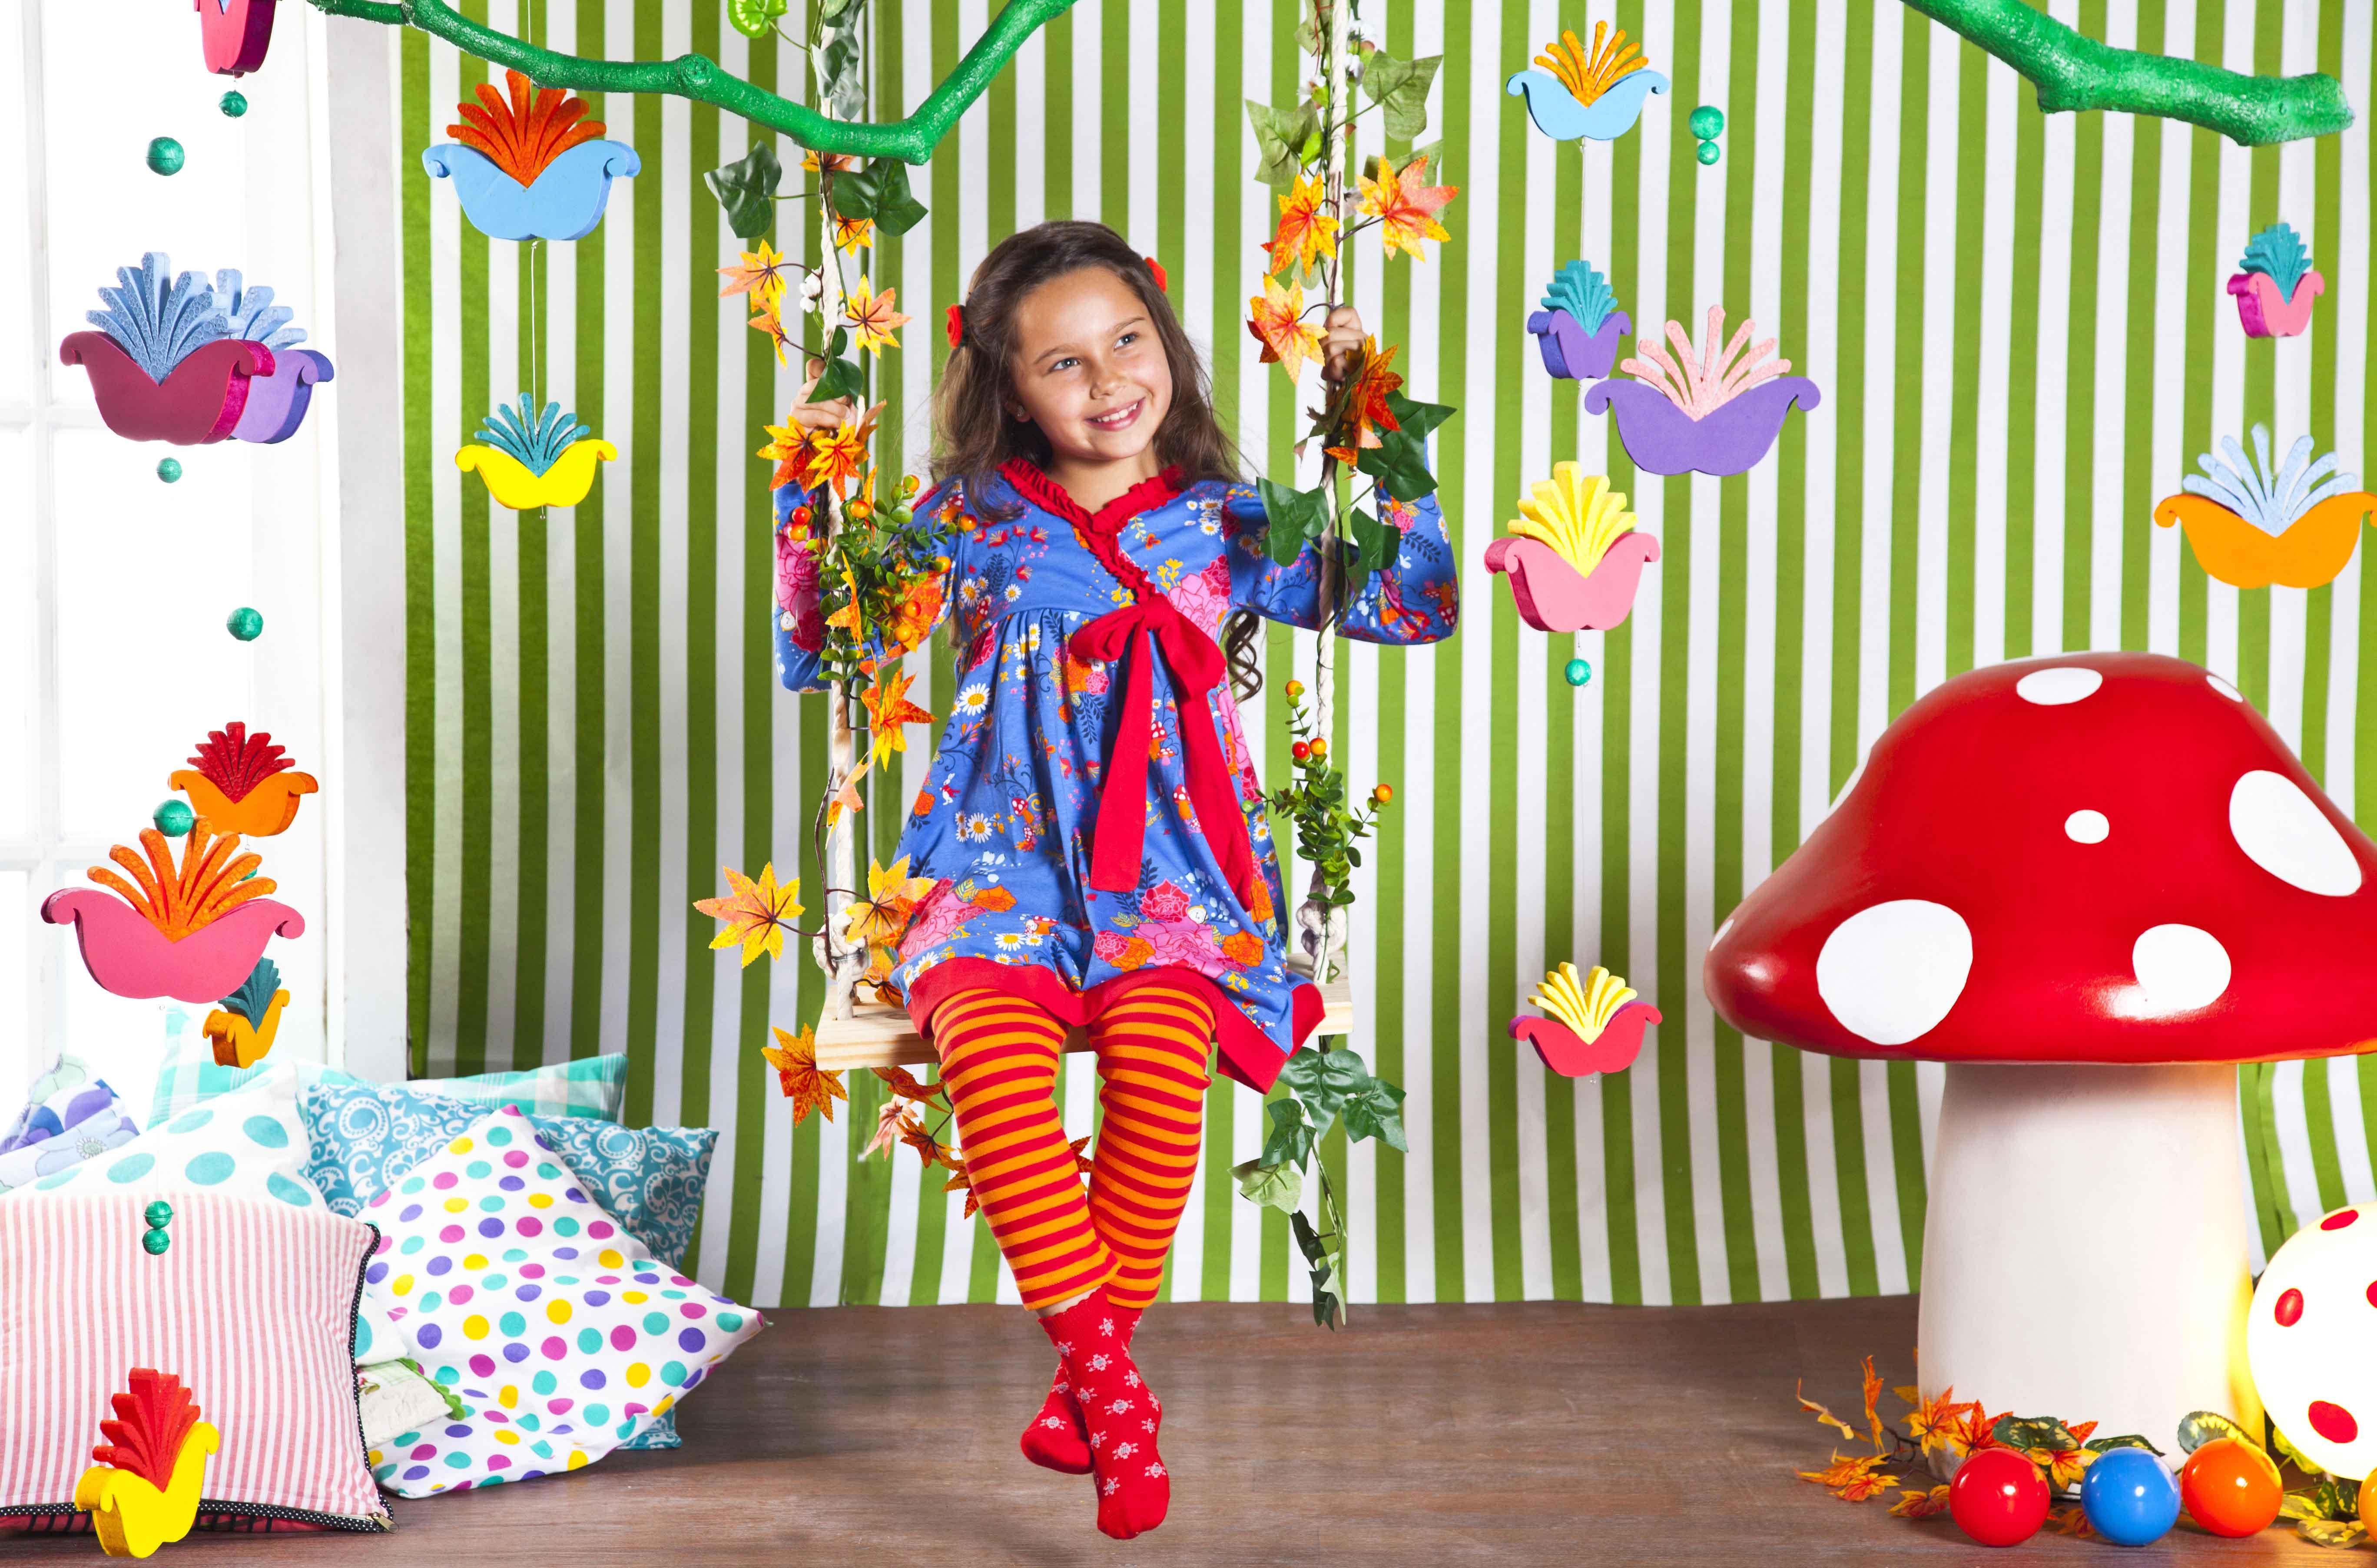 Zuppa presenta la colecci n invierno 2014 for Decoracion de vidrieras de ropa